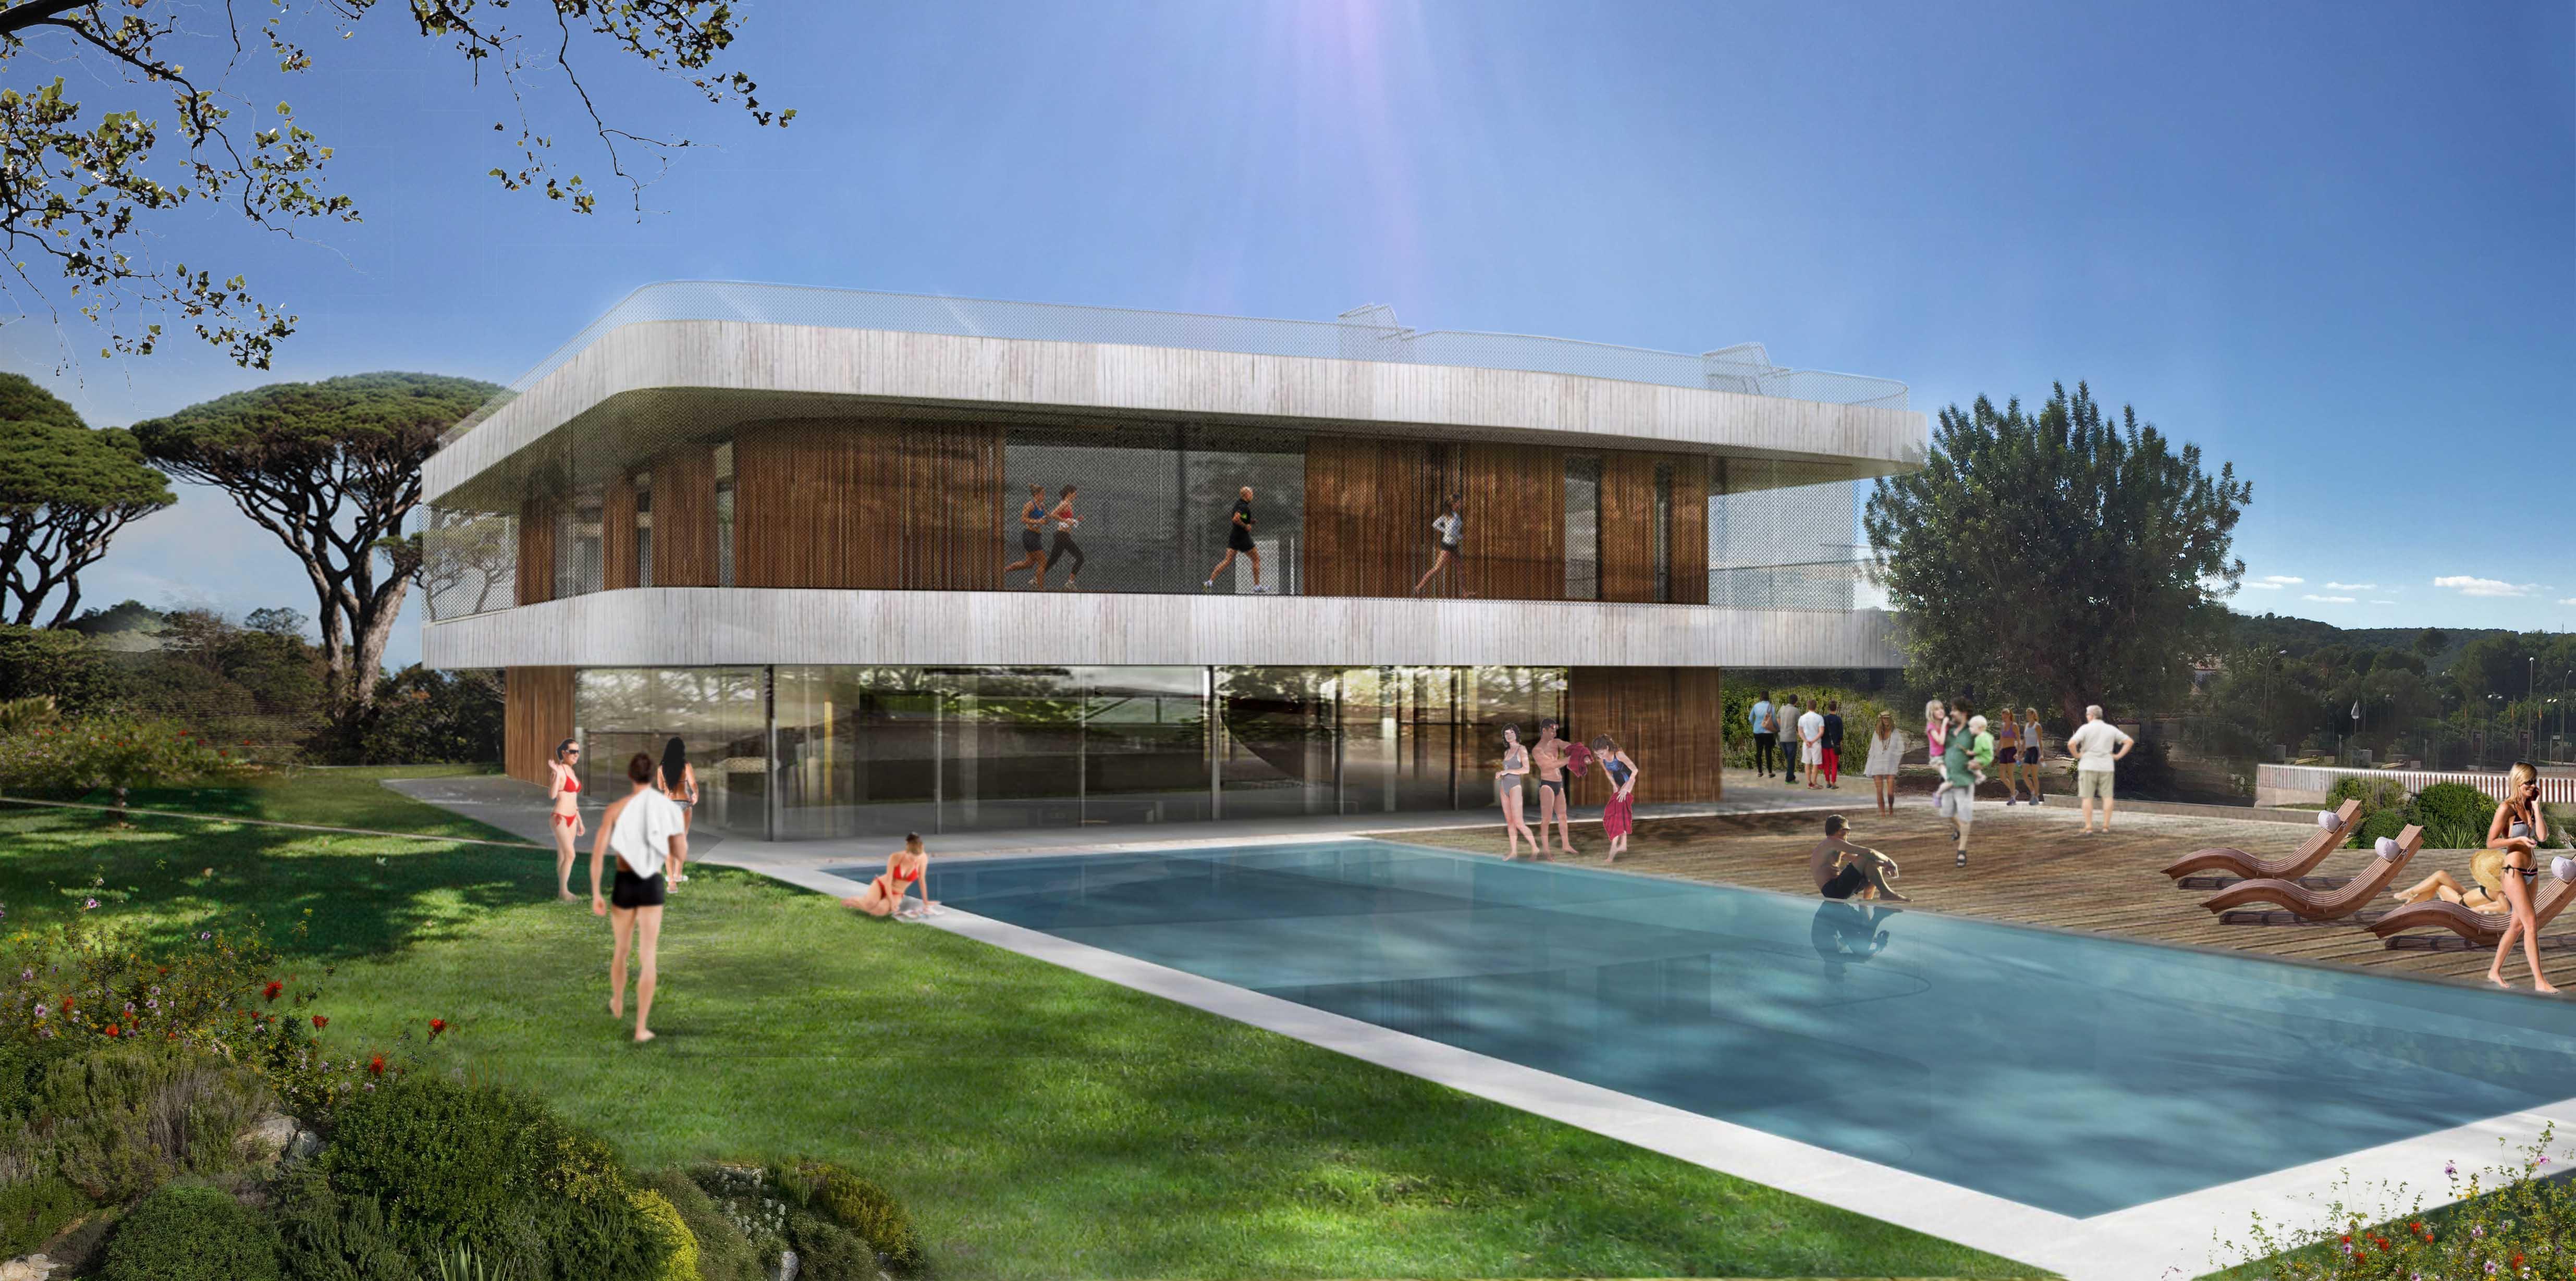 MALLORCA OPEN 2016 - News - GRAS - Reynés Architecture Studio